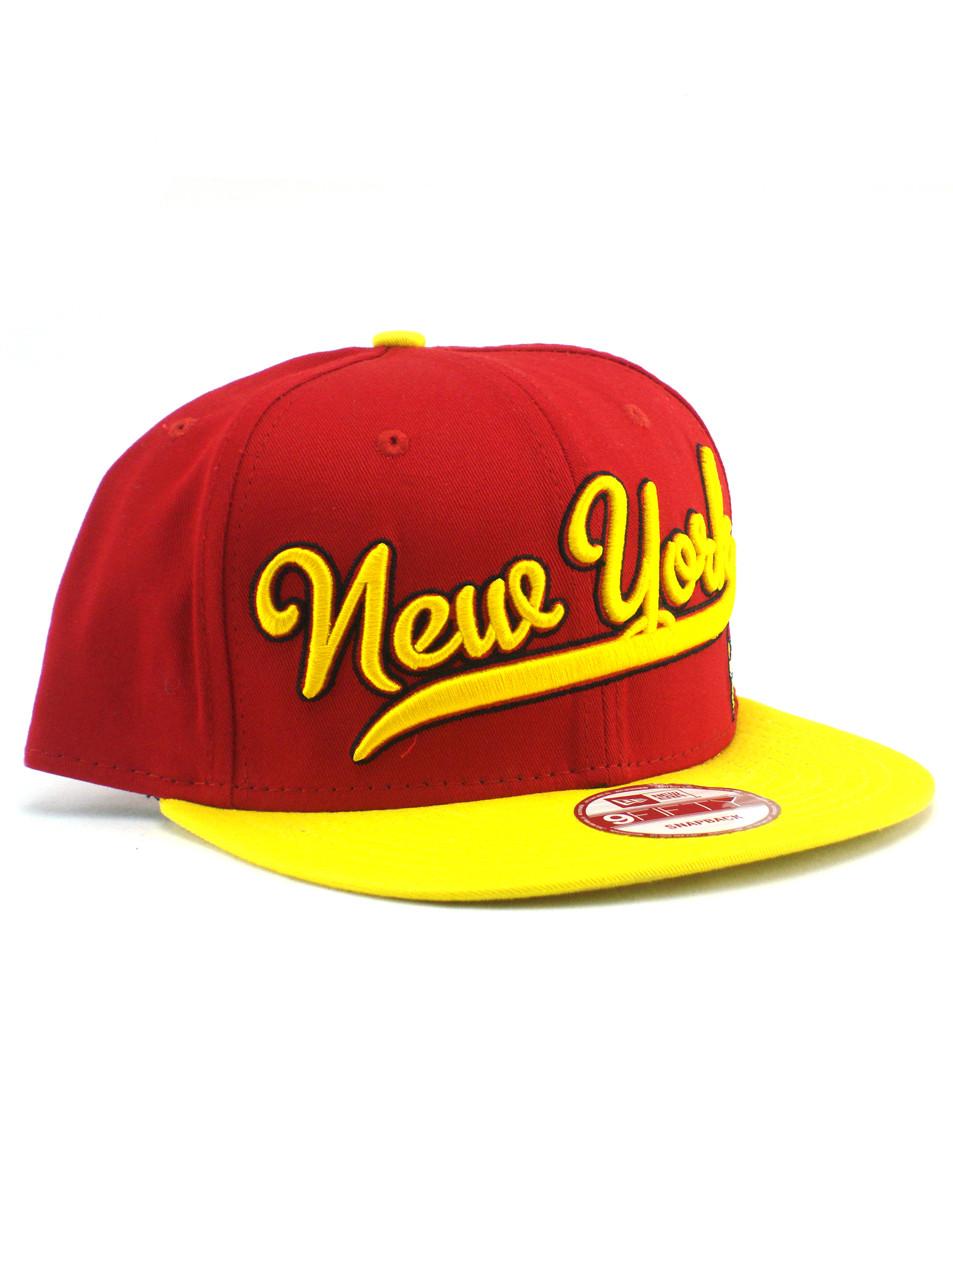 ... black silver 5bc88 11cdb spain new era new york iron man 9fifty snapback  hat view 1 1c2a7 fd001 ... 490d6d5de533